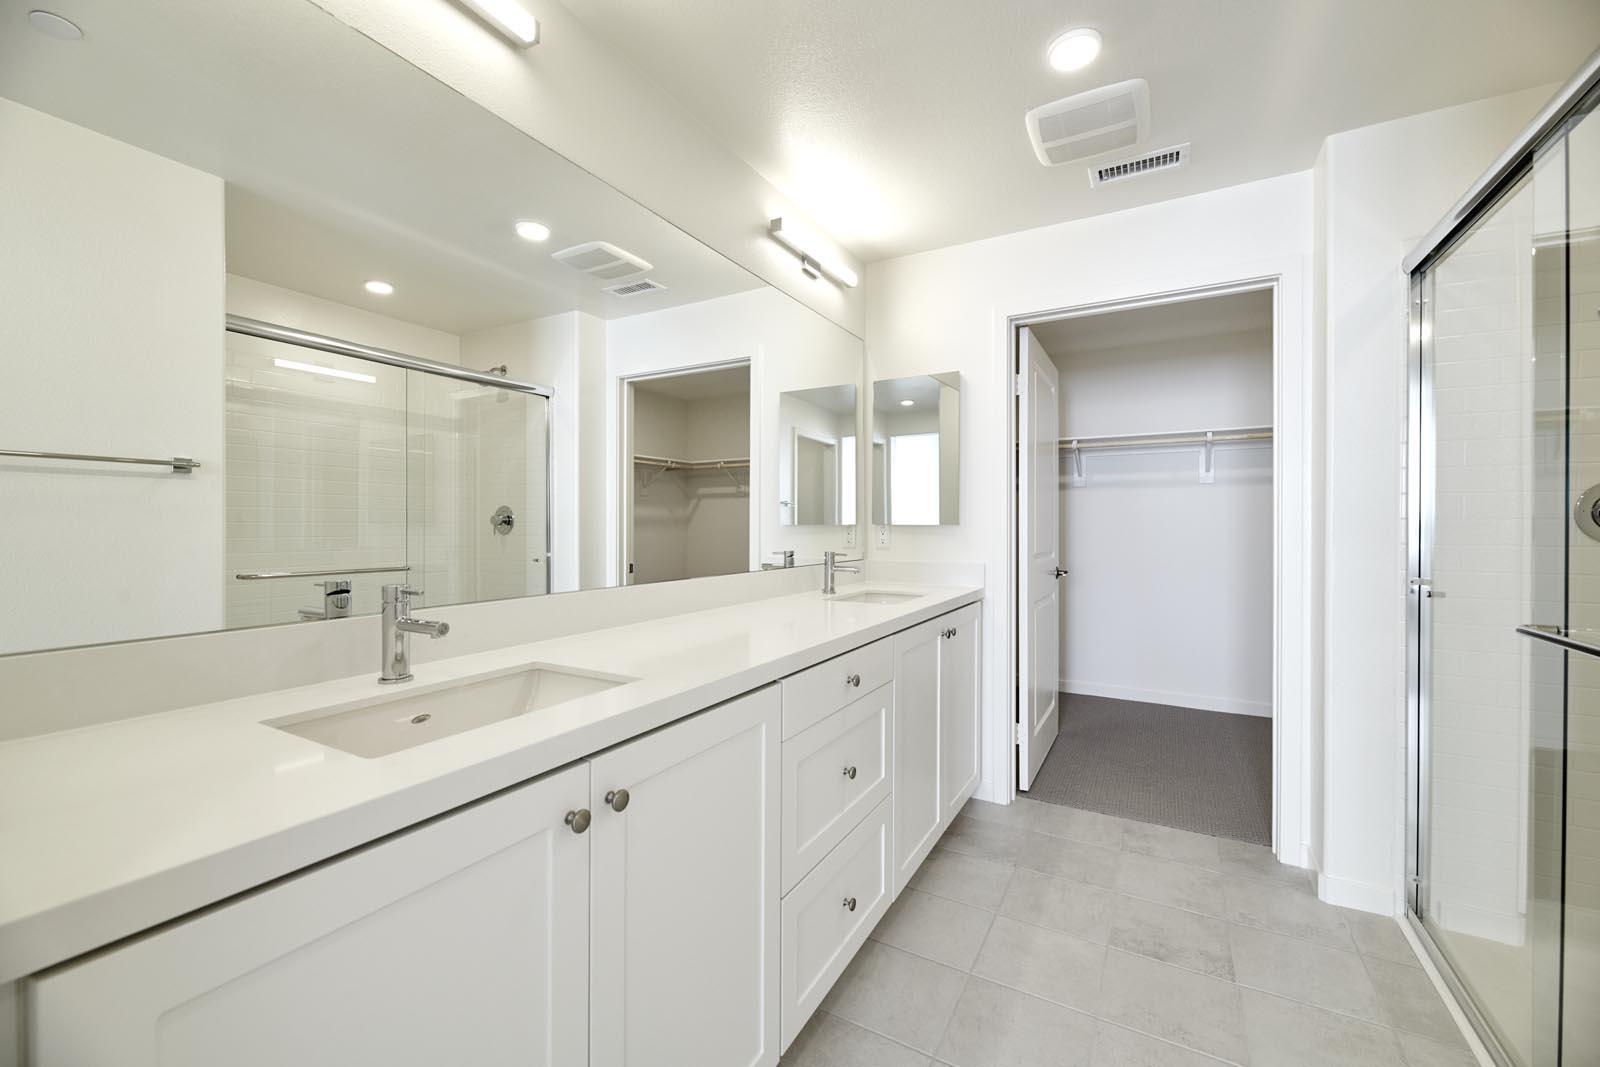 Master Bathroom   Residence 2   Aspire   New Homes in Rancho Cucamonga, CA   Van Daele Homes